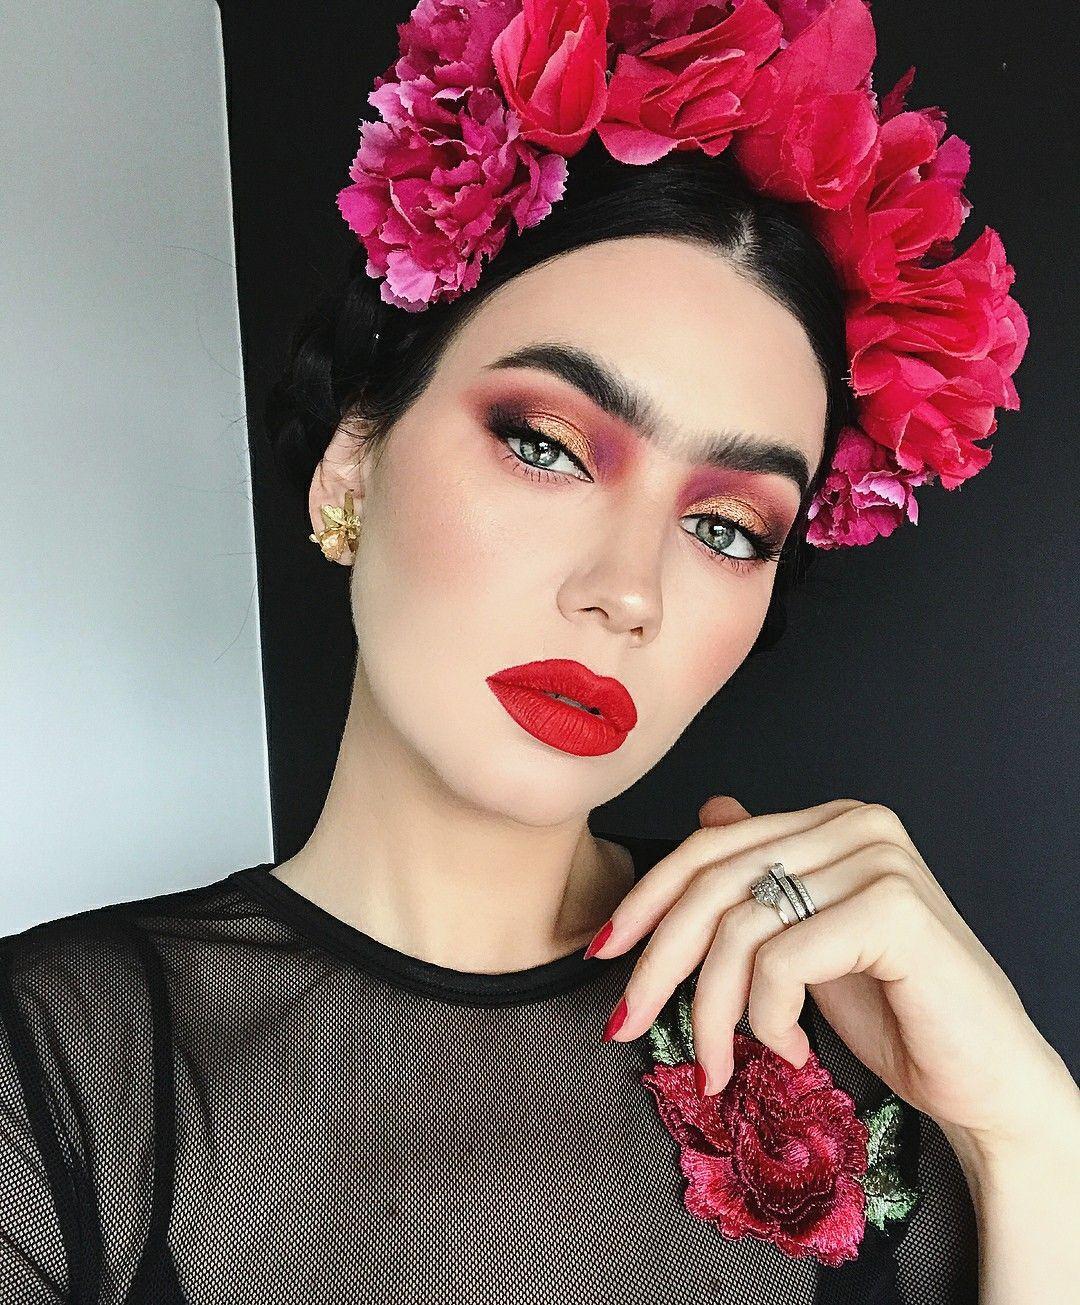 Frida Kahlo By Fashionista514 Halloween Disfraz Amigas Miedo Halloween Makeup Inspiration Frida Kahlo Makeup Halloween Makeup Looks